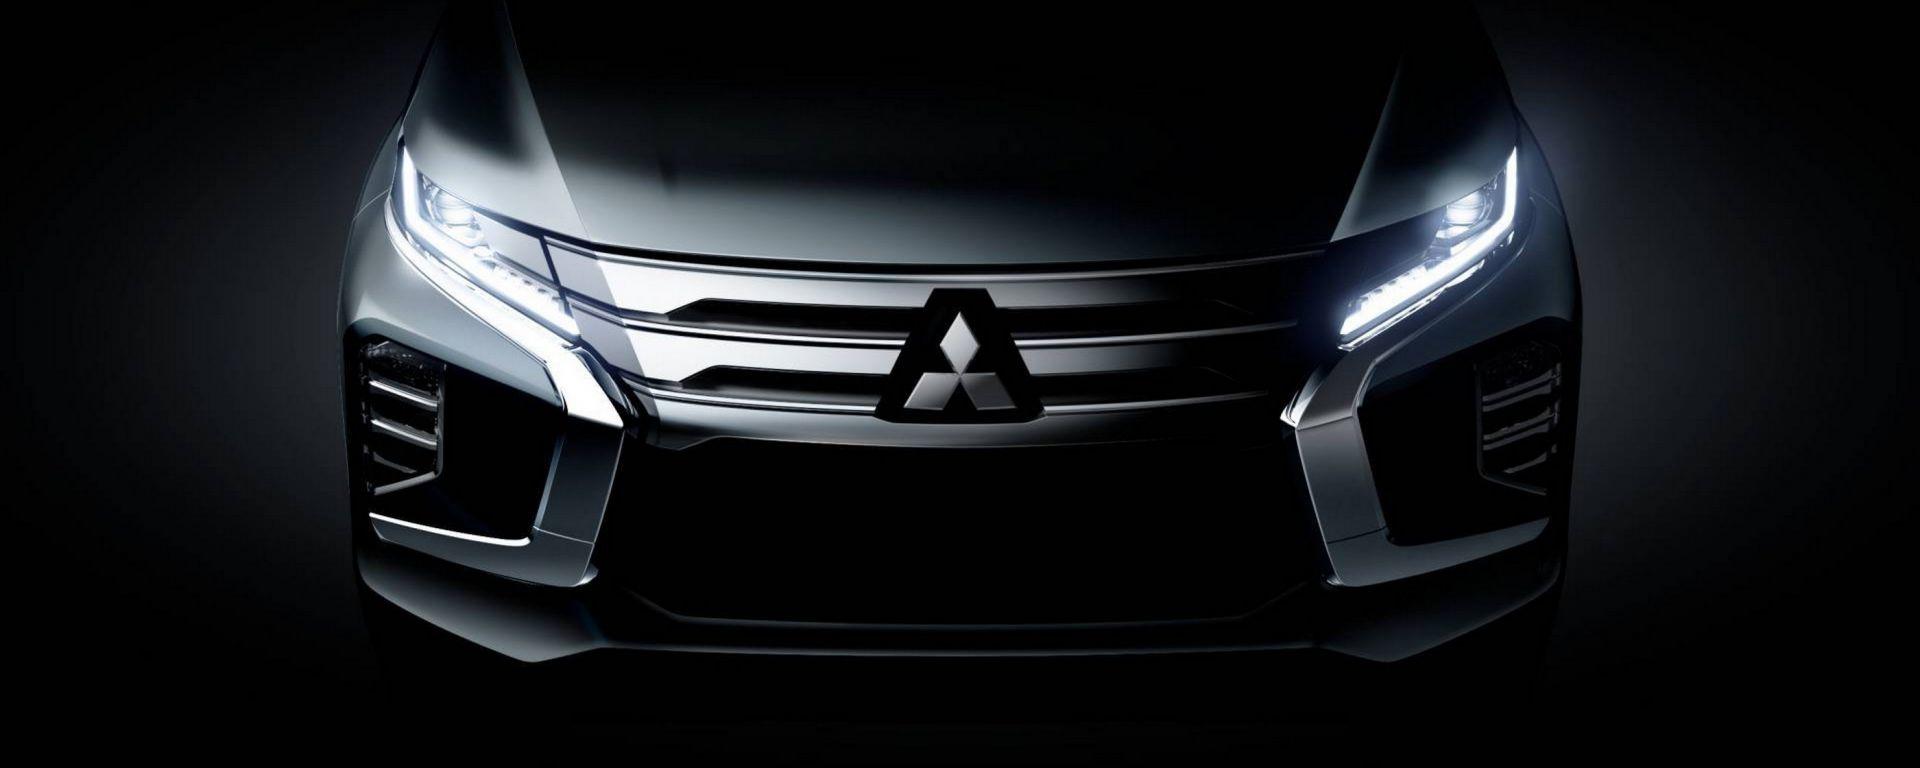 Mitsubishi Pajero Sport 2020, il teaser